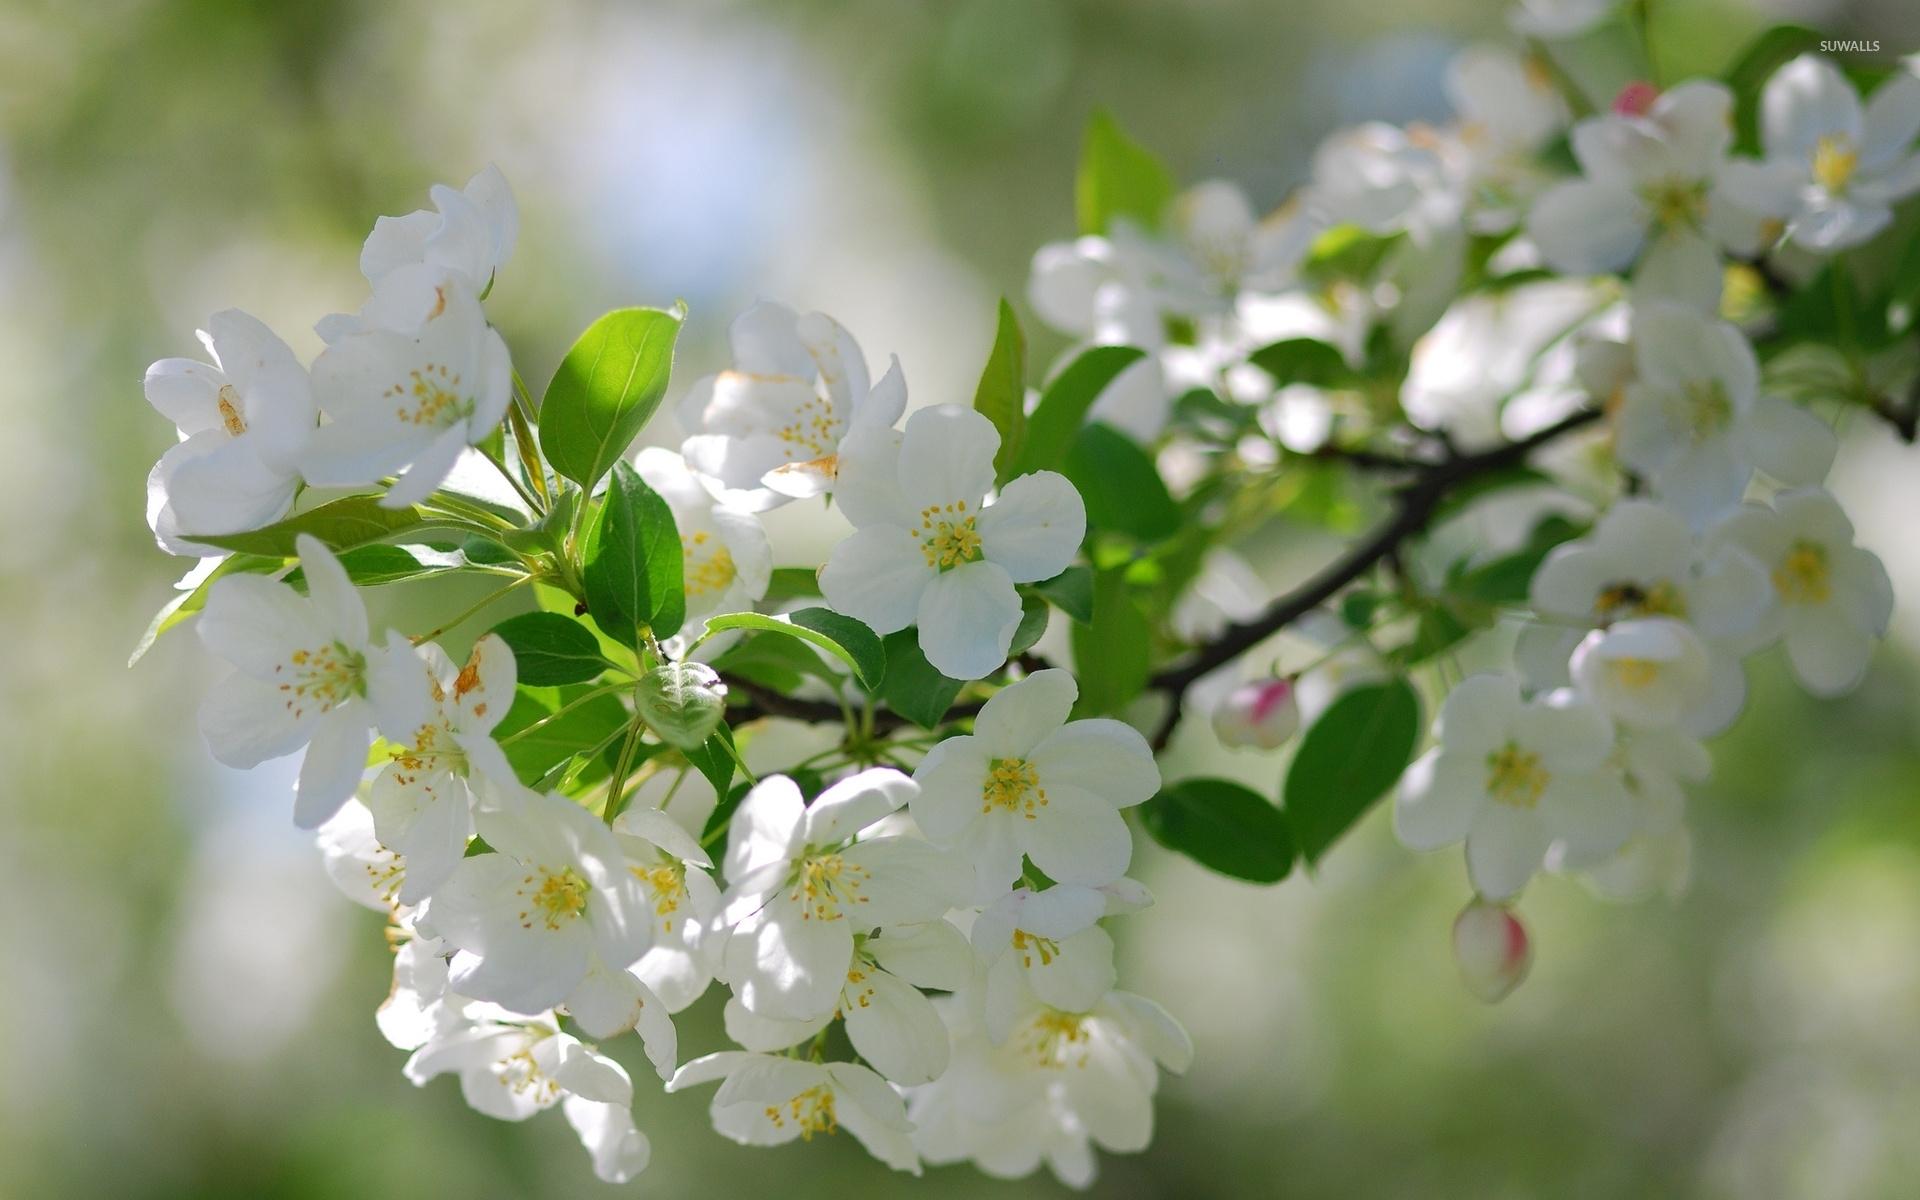 White cherry blossoms wallpaper - Flower wallpapers - #36554